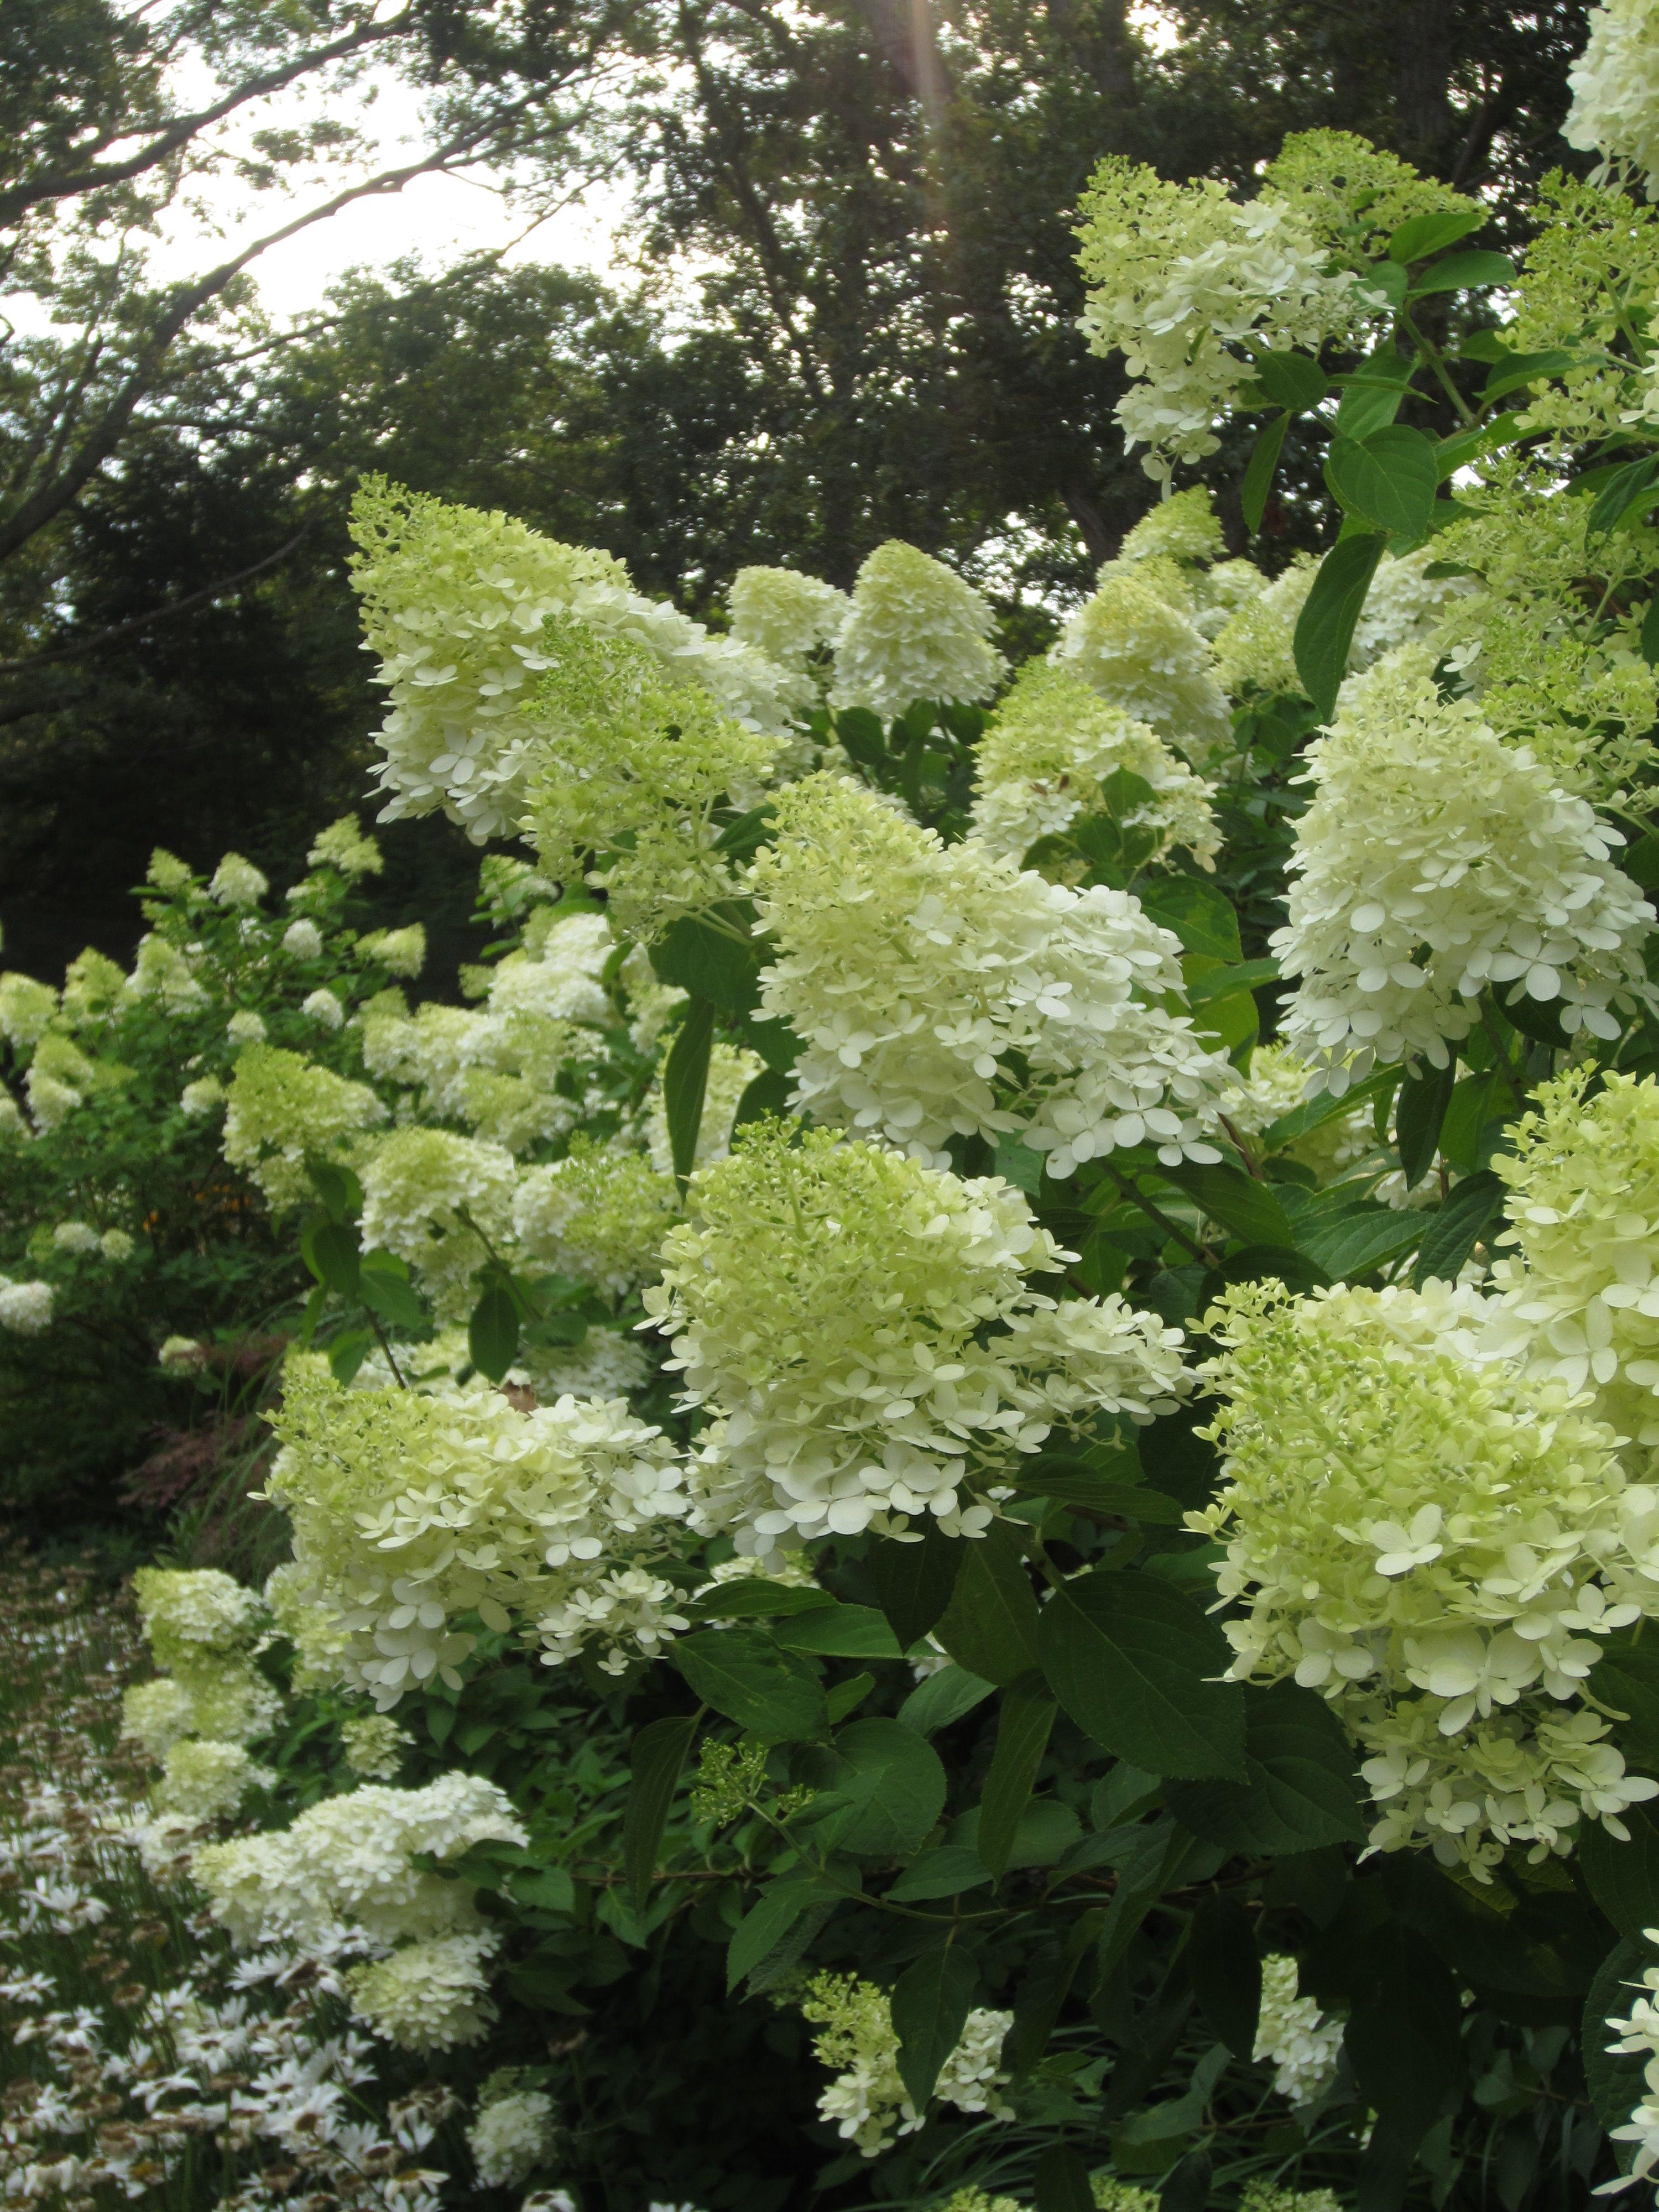 Limelight hydrangea outdoor gardening pinterest for Limelight hydrangea